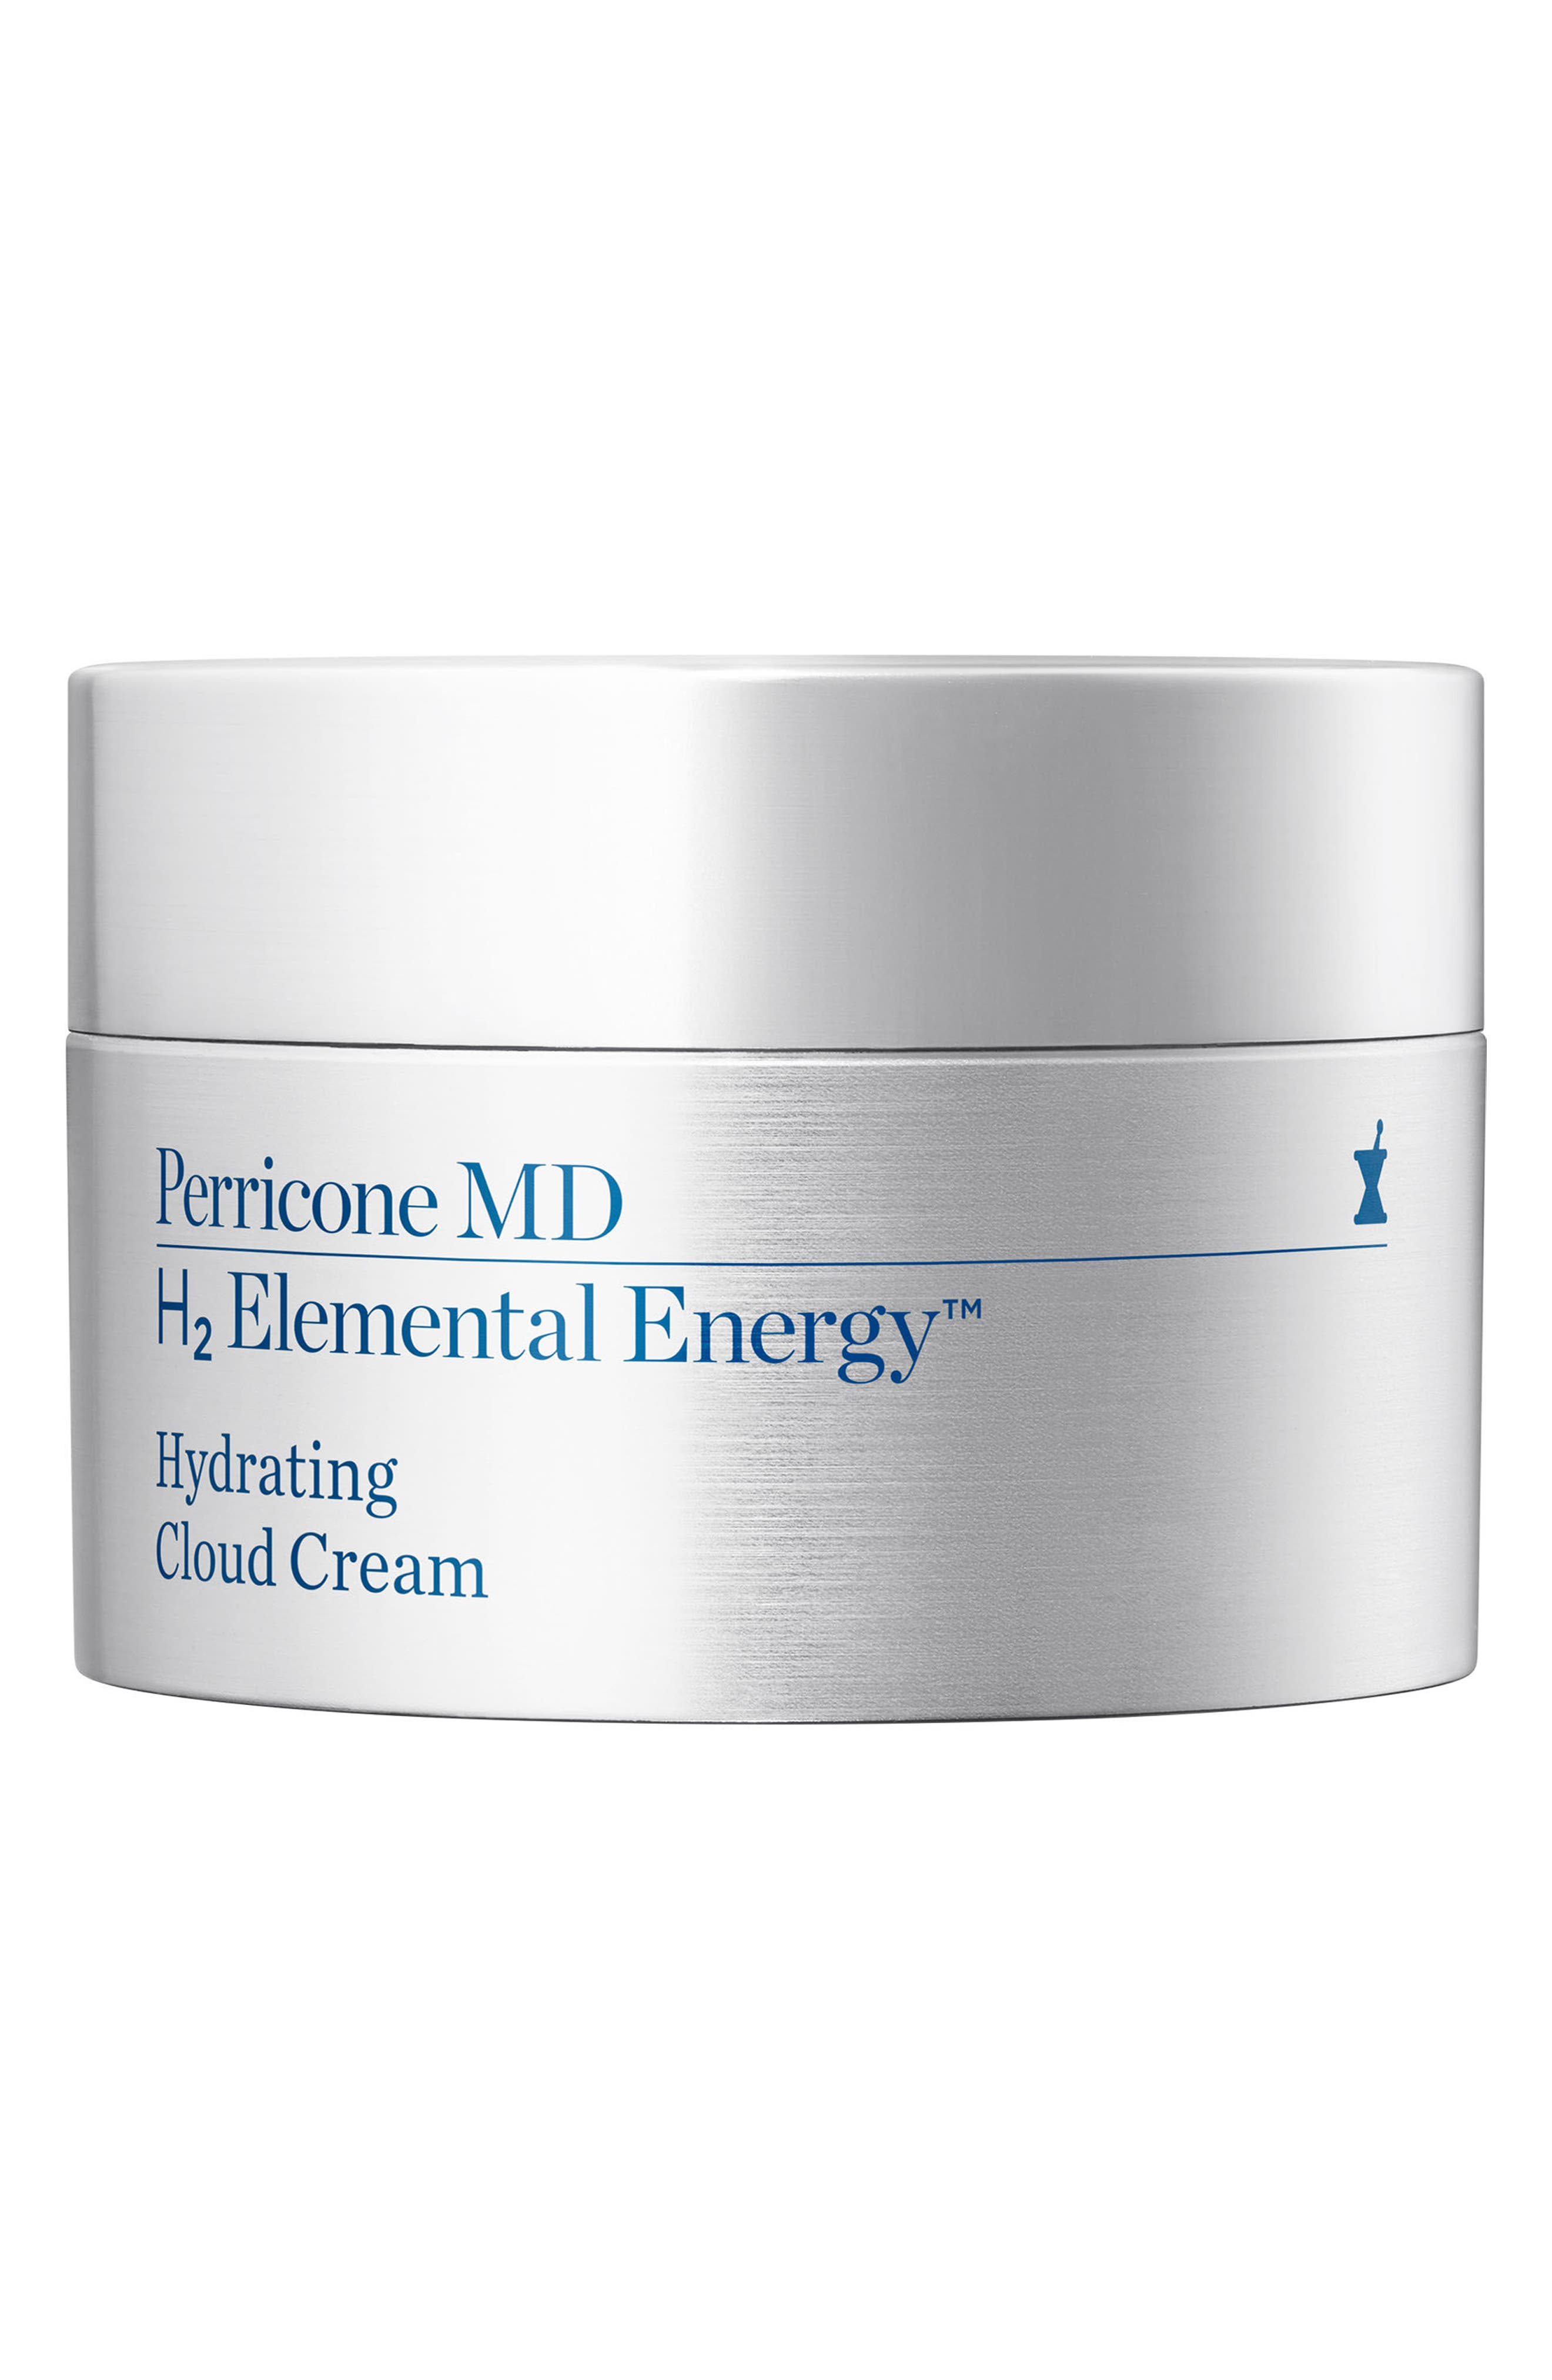 Main Image - Perricone MD H2 Elemental Energy Hydrating Cloud Cream